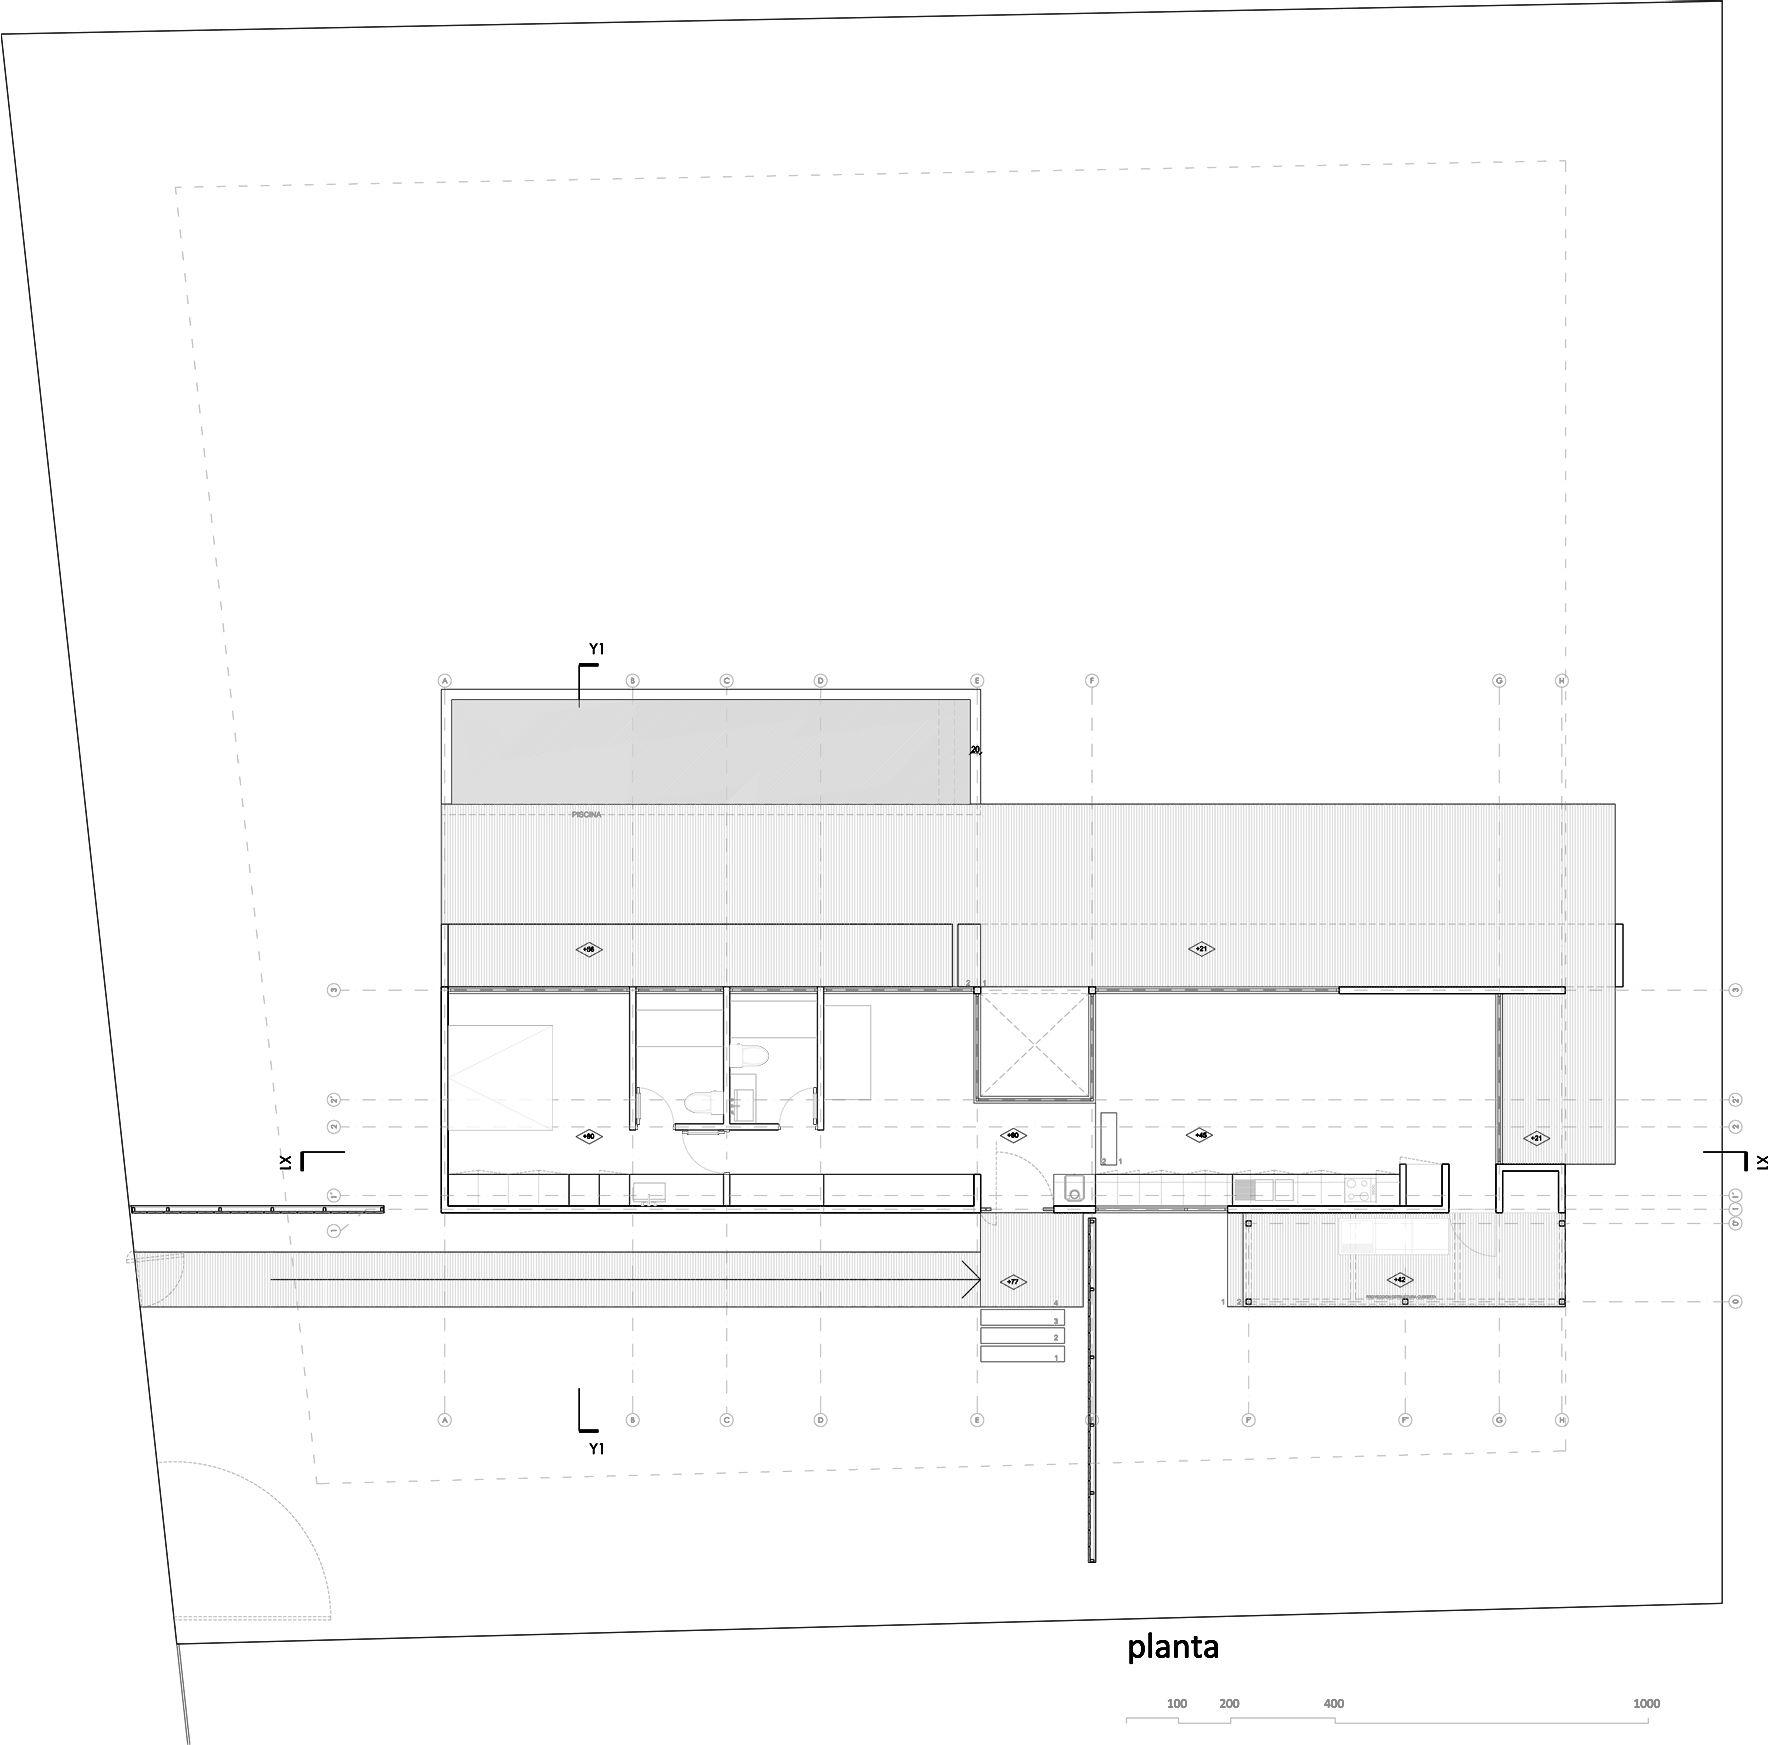 Galería - Casa Santa María / Etcheberrigaray   Matuschka - 141